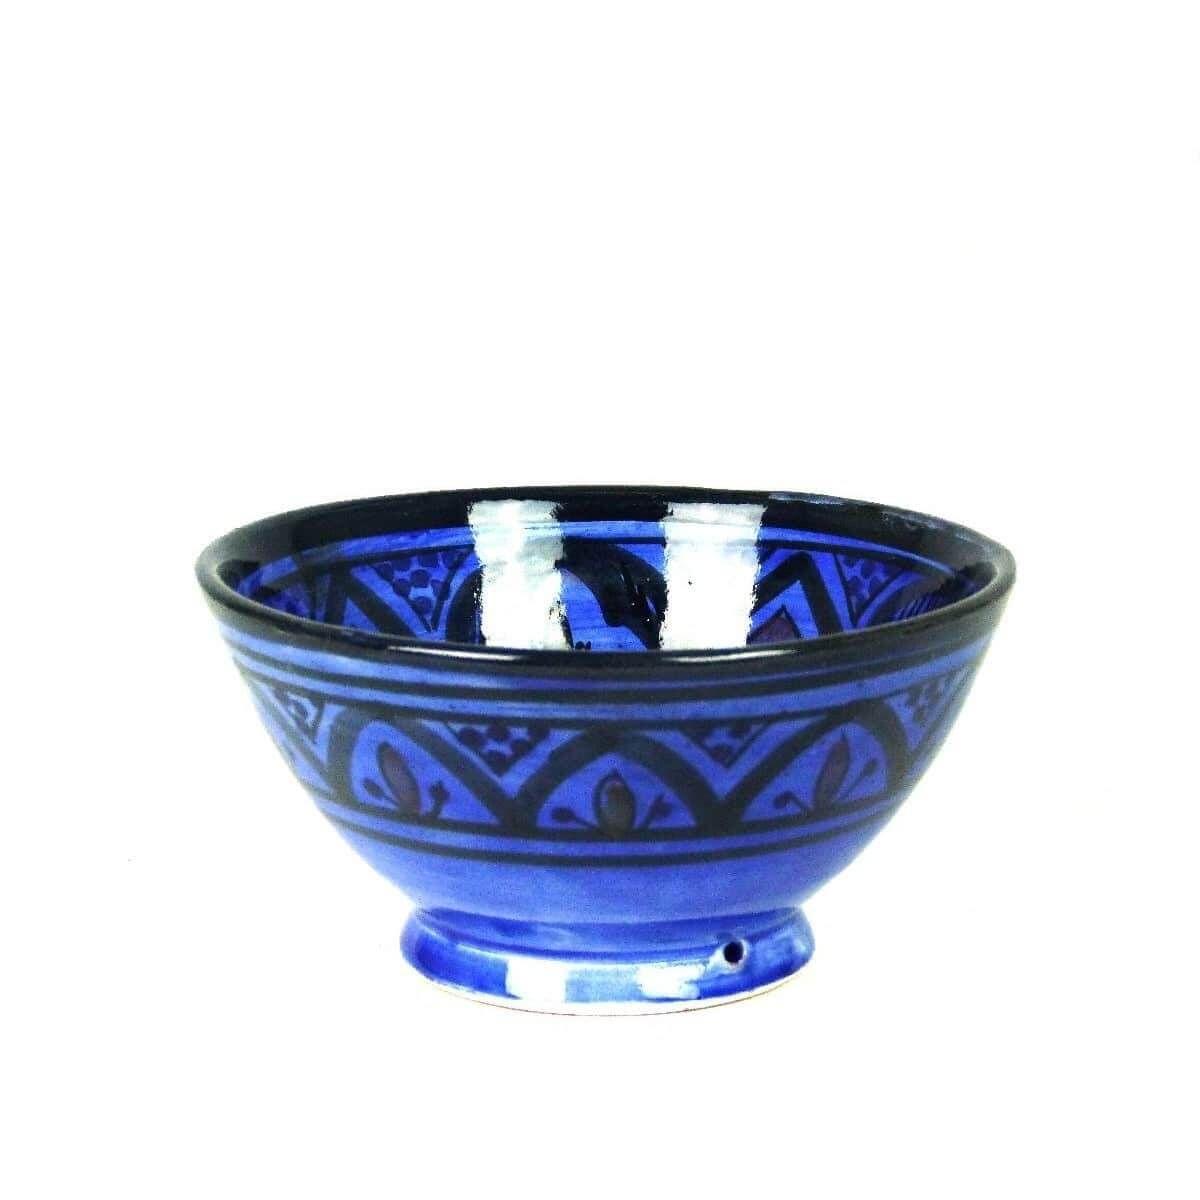 orientalische marokkanische keramikschale keramik obst salat reis schale klein ebay. Black Bedroom Furniture Sets. Home Design Ideas